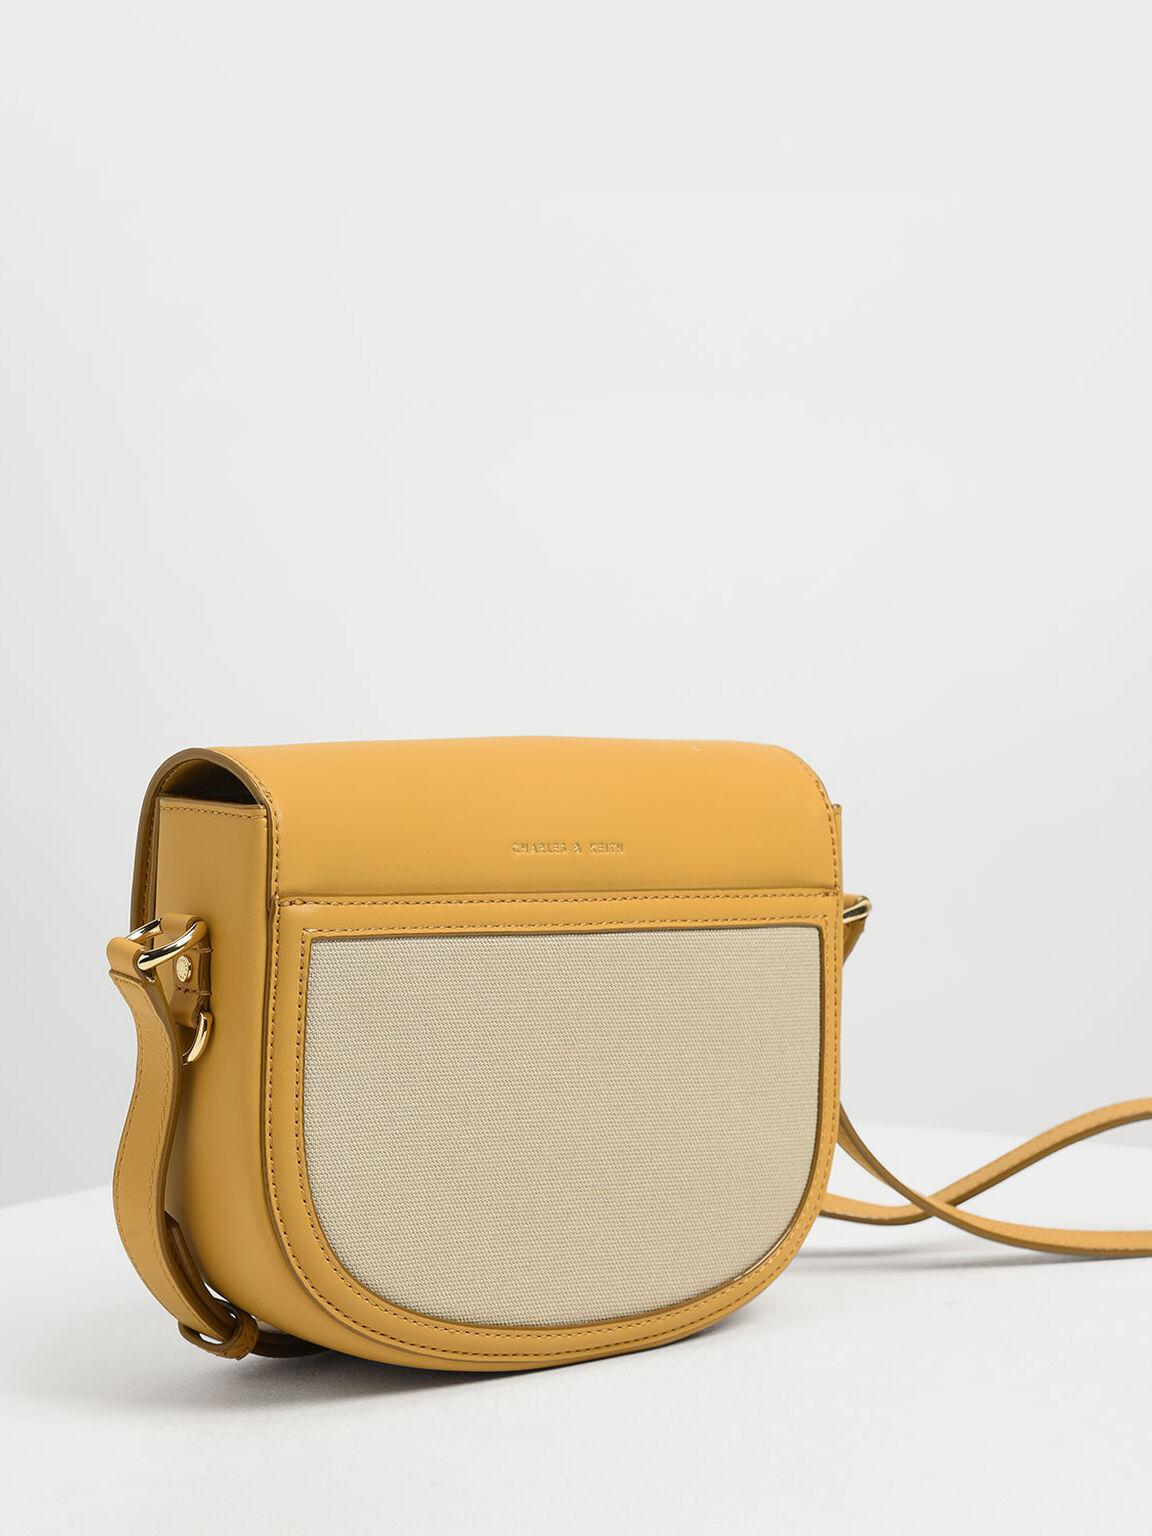 Ring Buckle Saddle Crossbody Bag, Mustard, hi-res